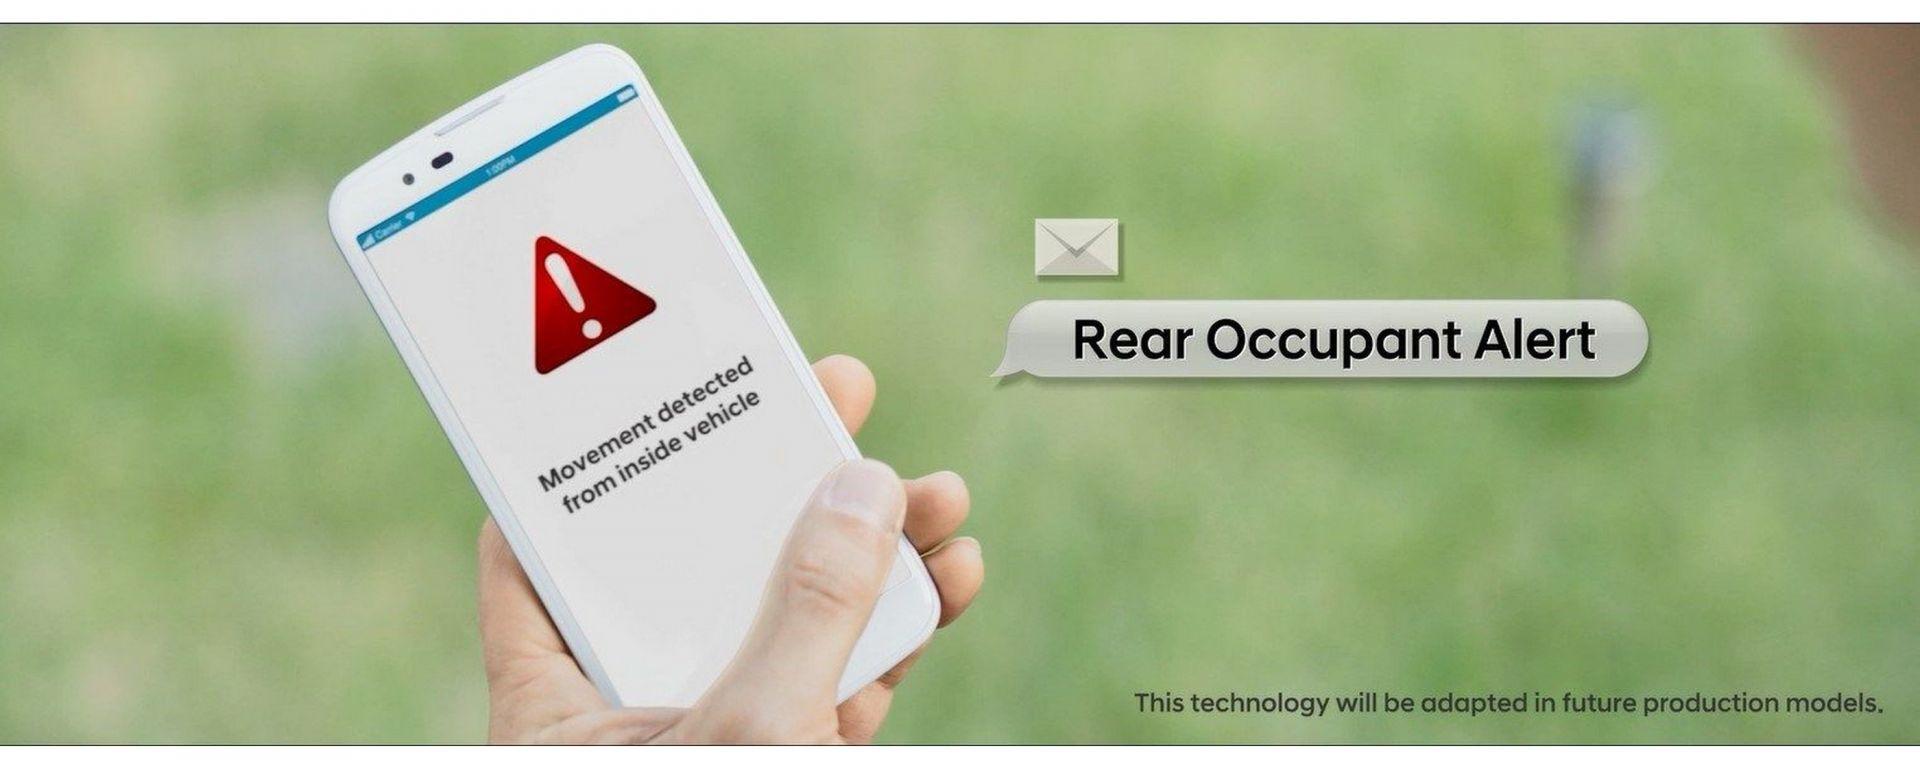 Hyundai Rear Occupant Alert: avviso allo smartphone con sistema Hyundai'sBlueLink